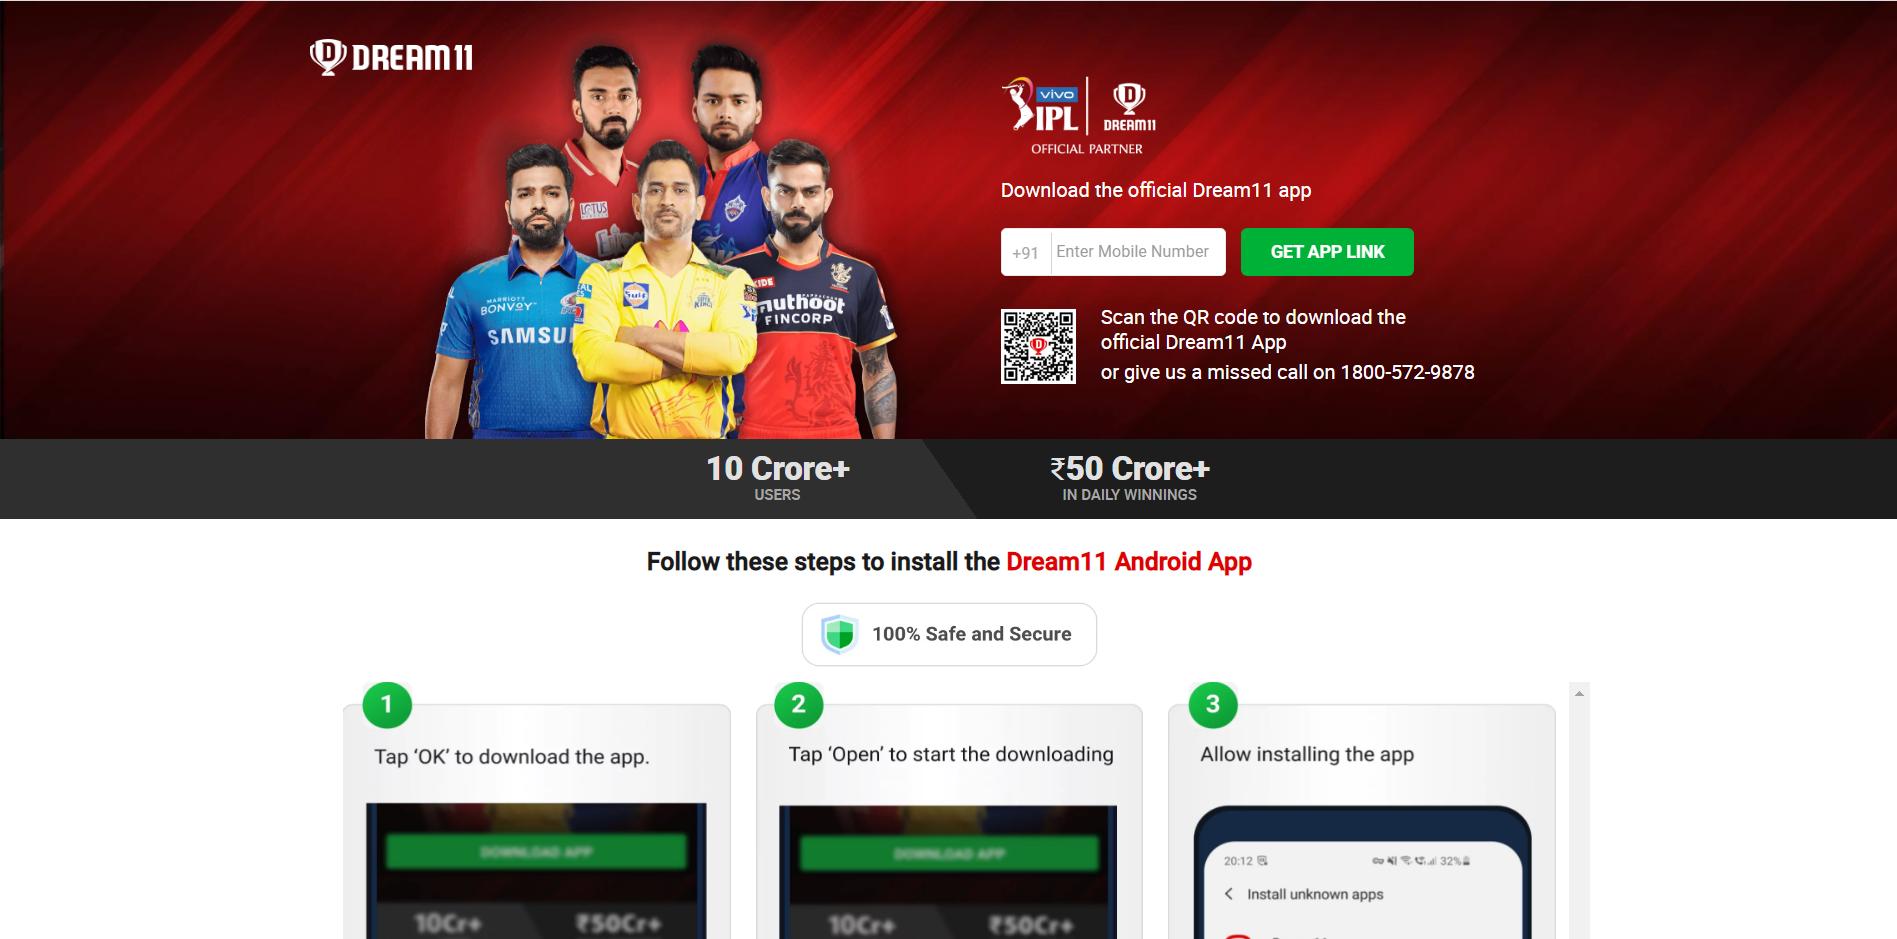 Dream11 app link